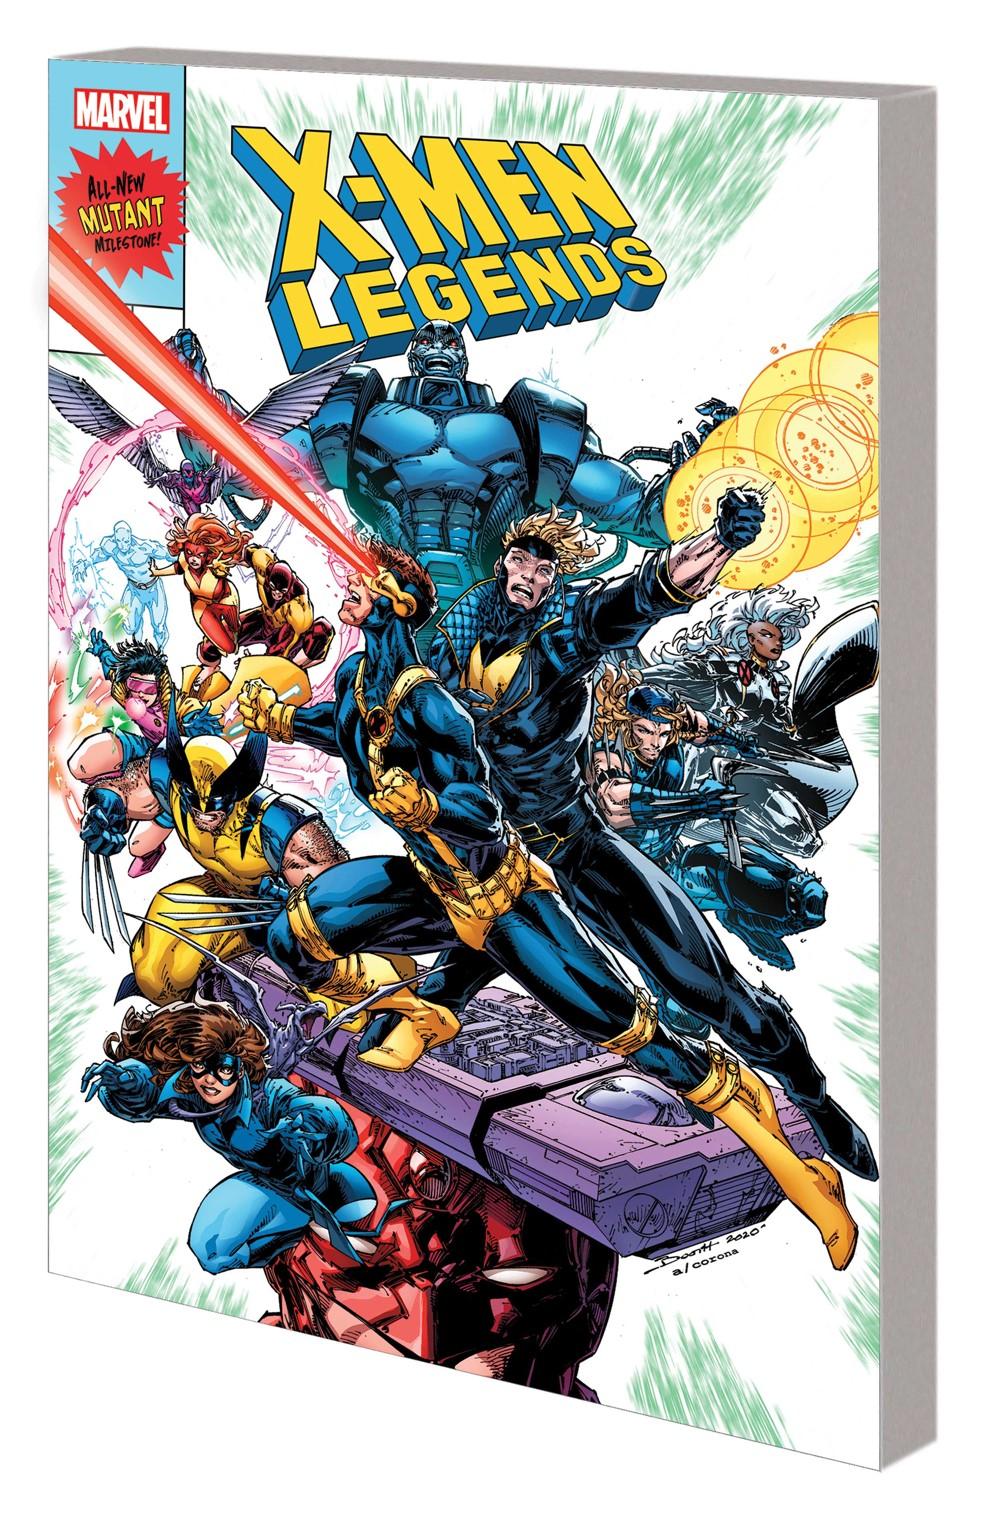 XMLEGENDS_VOL_1_TPB Marvel Comics September 2021 Solicitations